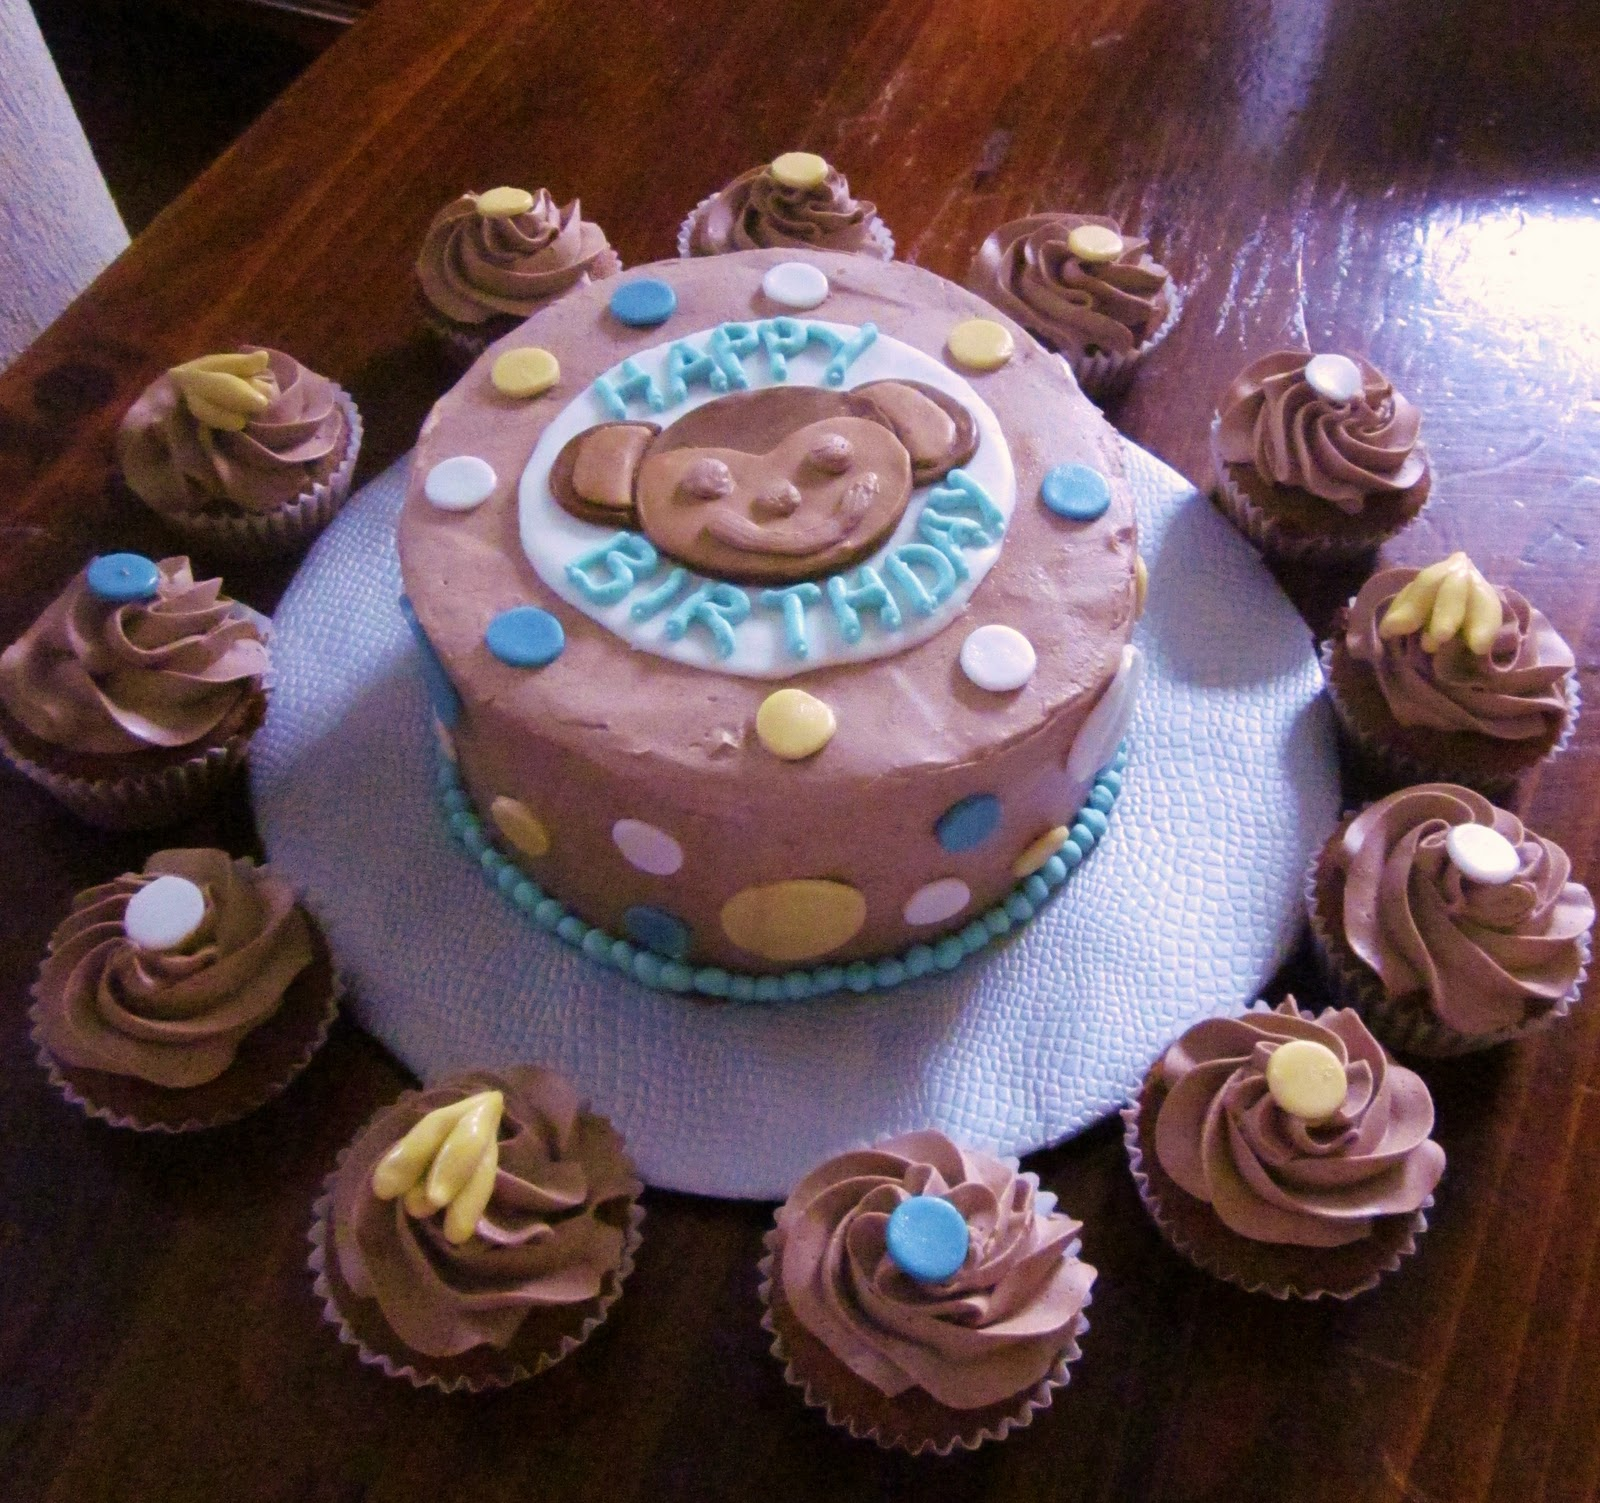 Second Generation Cake Design Monkey Birthday Cake Matching Cupcakes